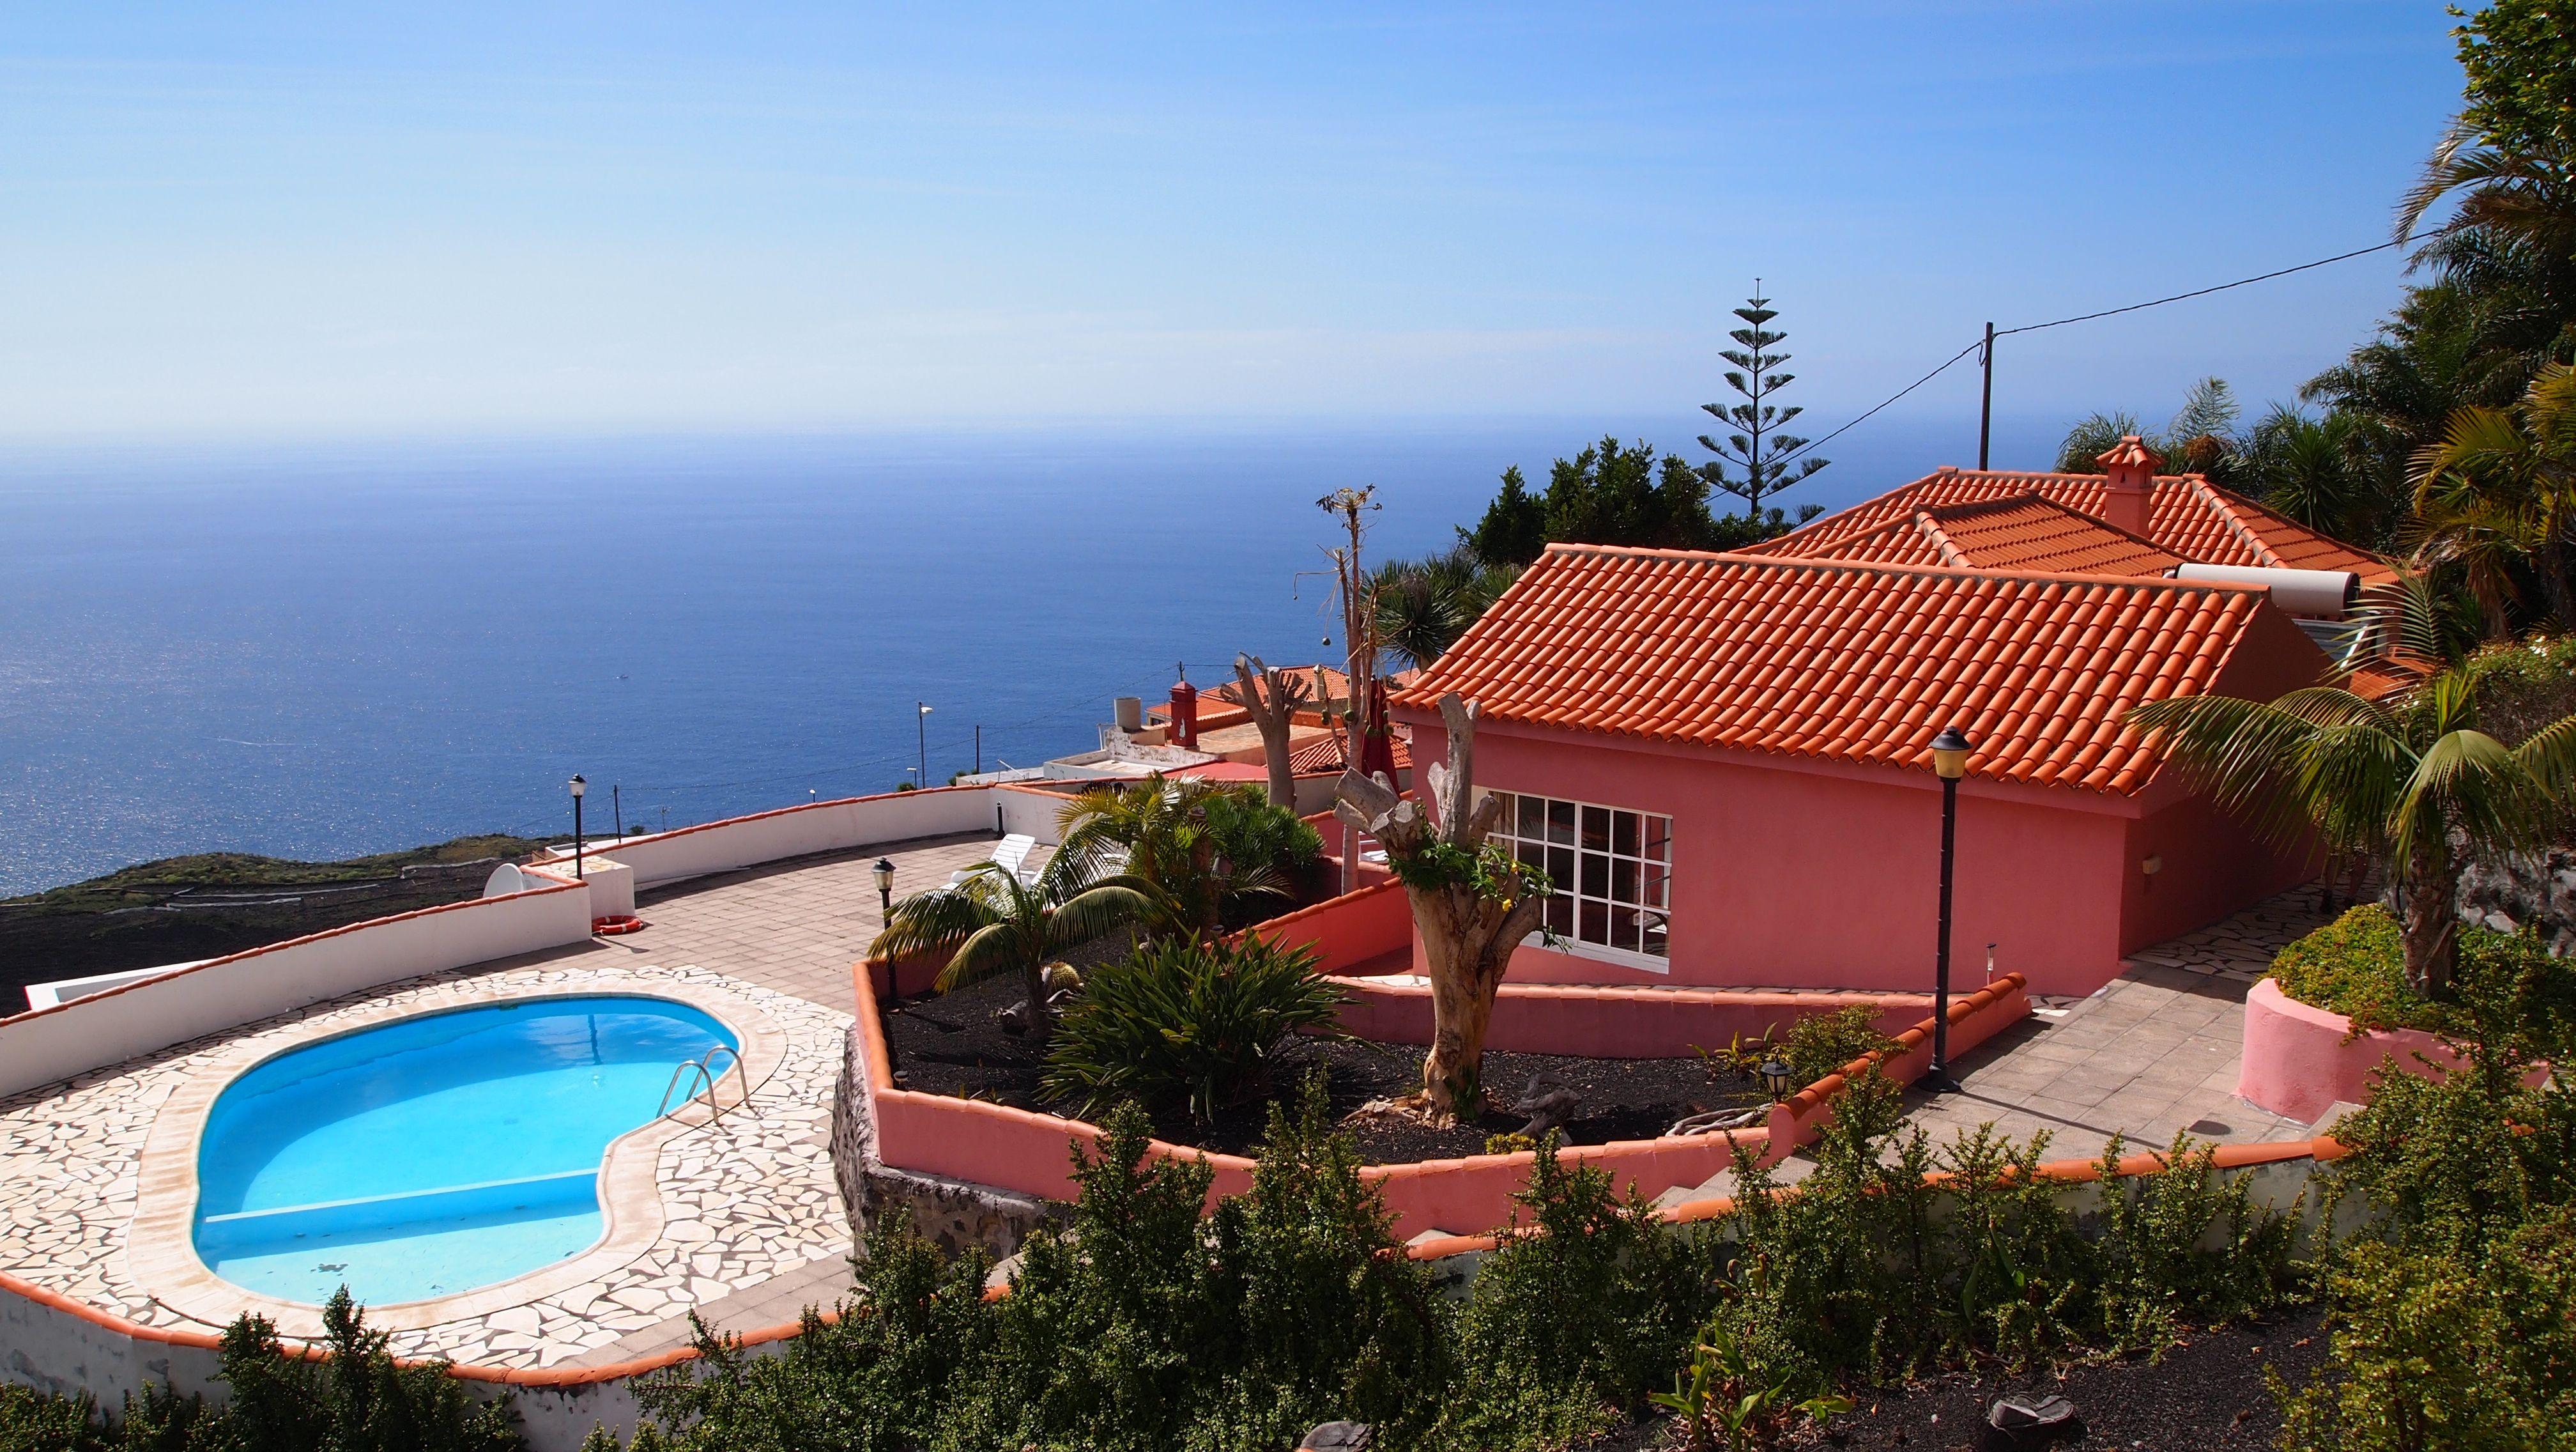 Casa Eva, La Palma Zwembaden, Spanje, Overwinteren